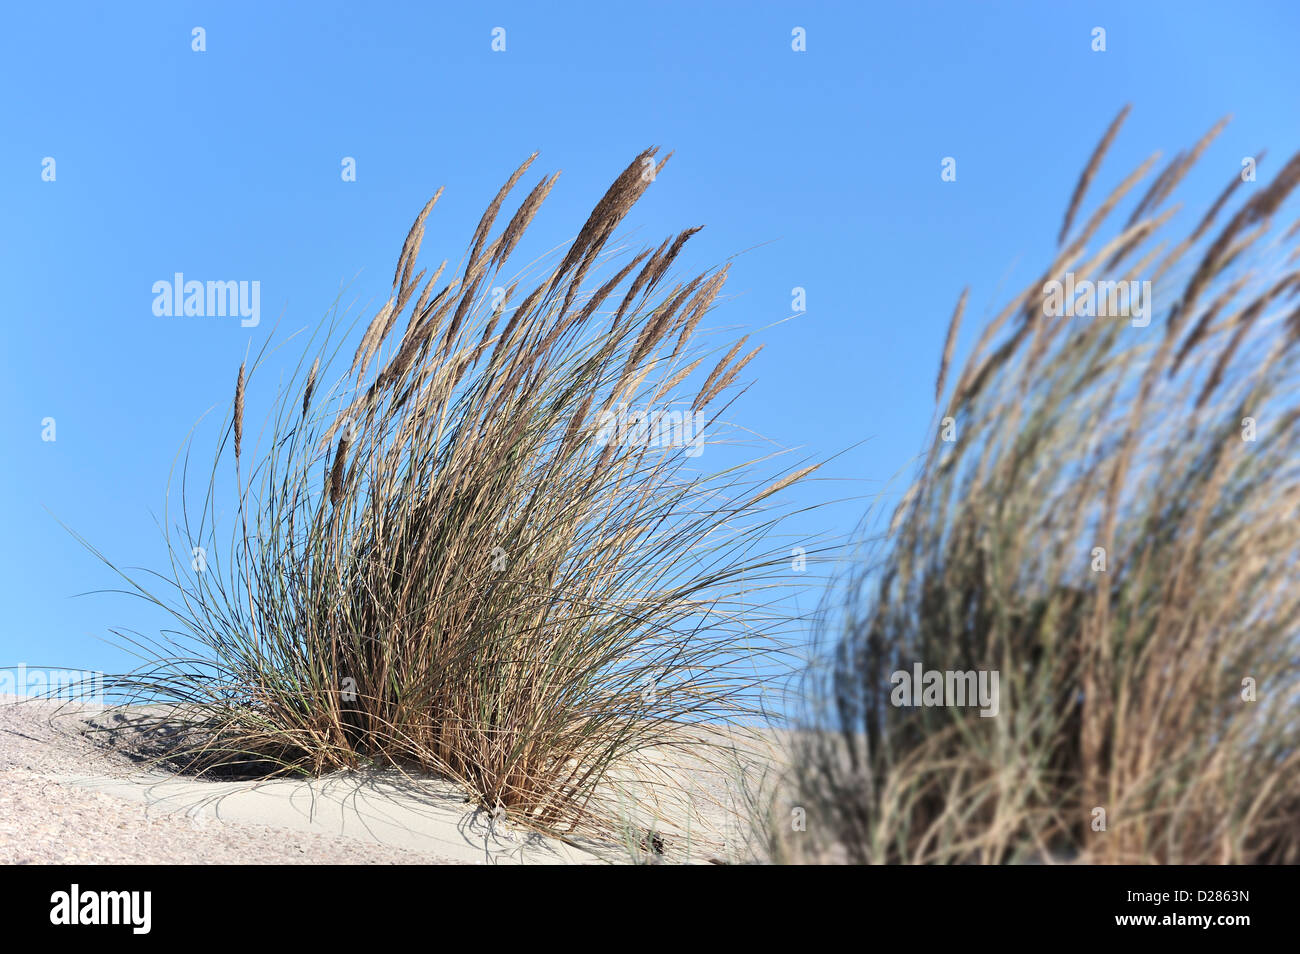 European marram grass / beach grass / beachgrass (Ammophila arenaria) growing as pioneer species along the North - Stock Image